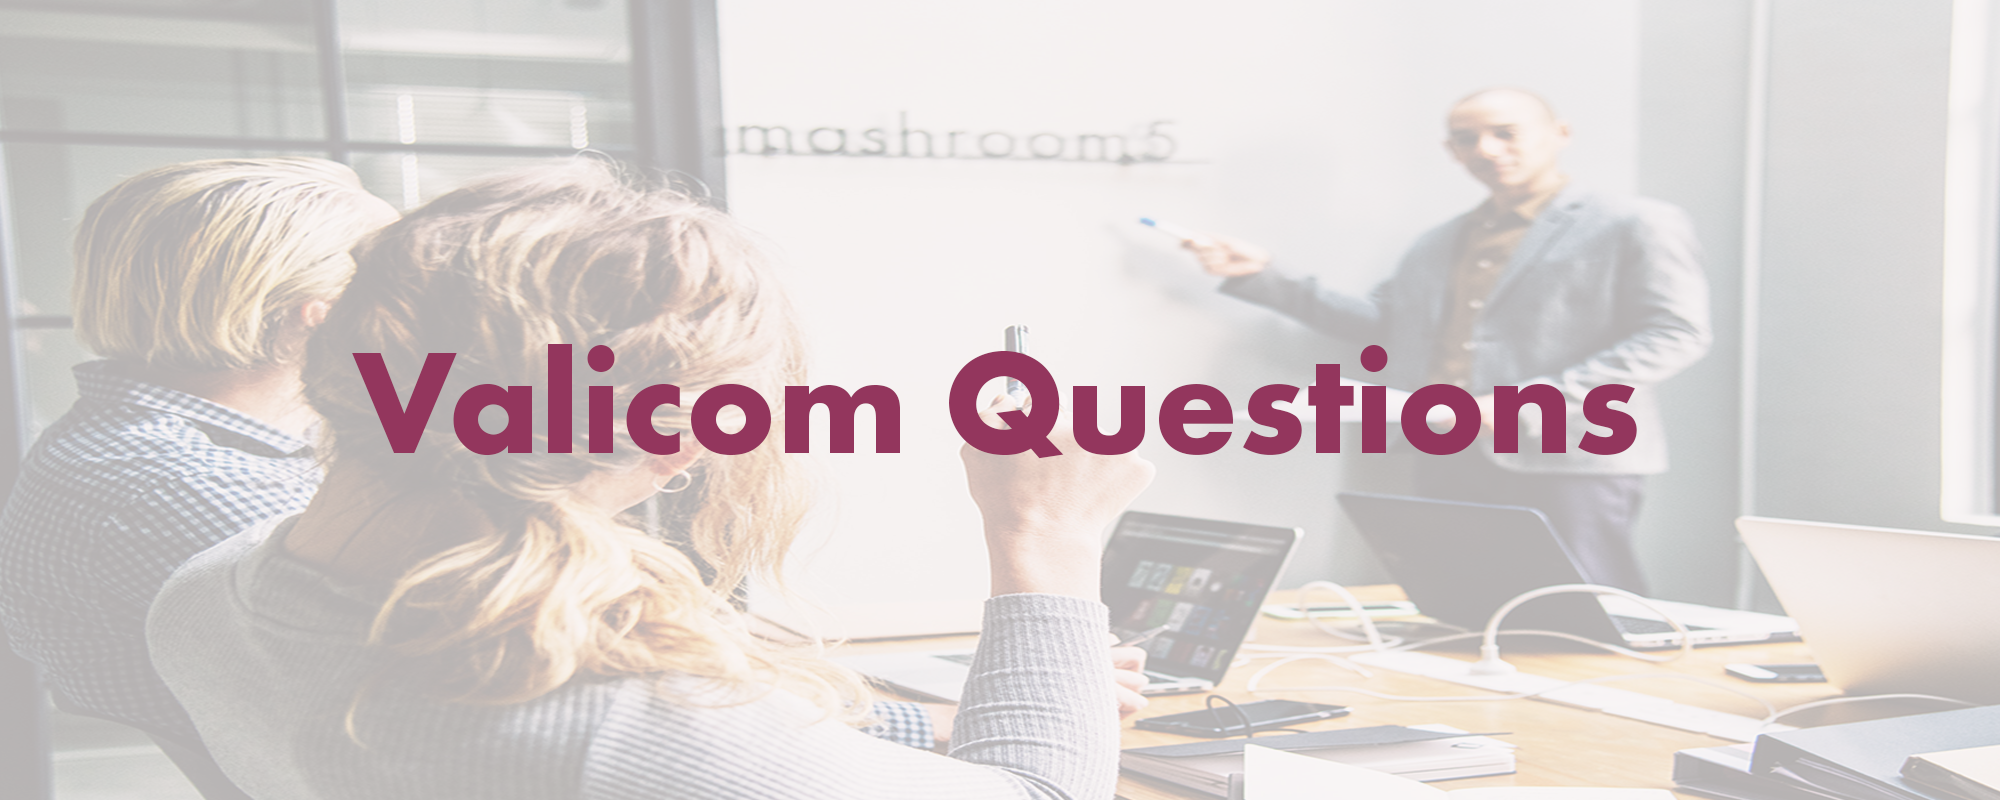 Valicom Questions.png